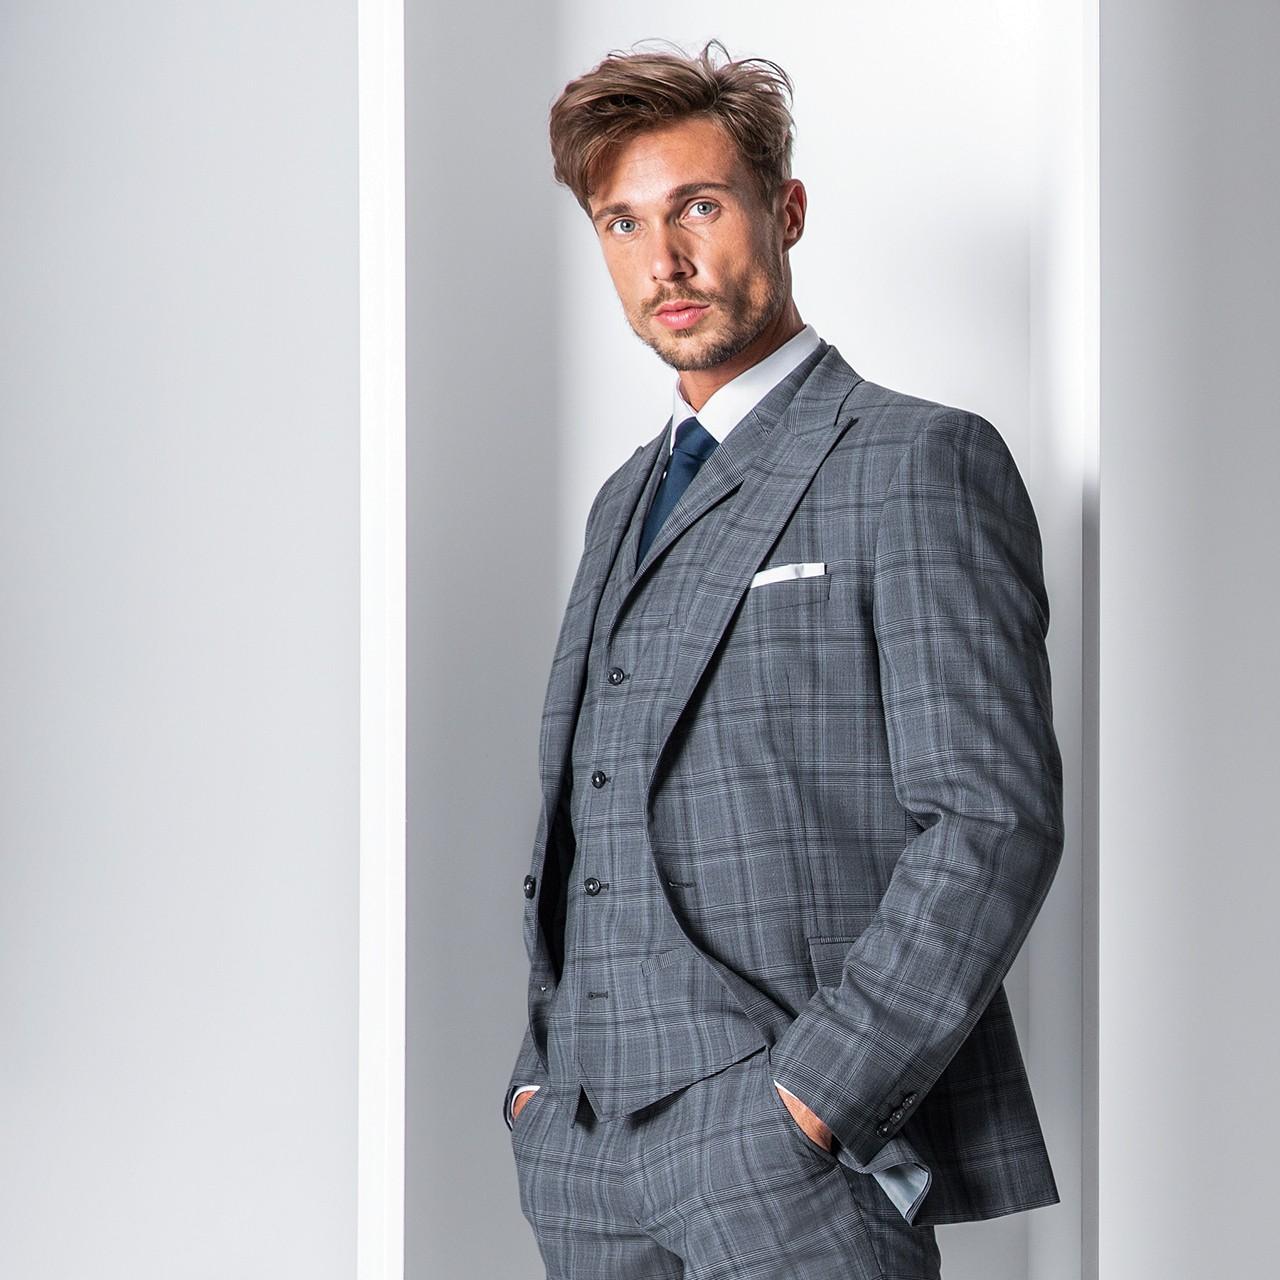 Premium Herren-Sakko Greiff® | bedrucken, besticken, bedrucken lassen, besticken lassen, mit Logo |